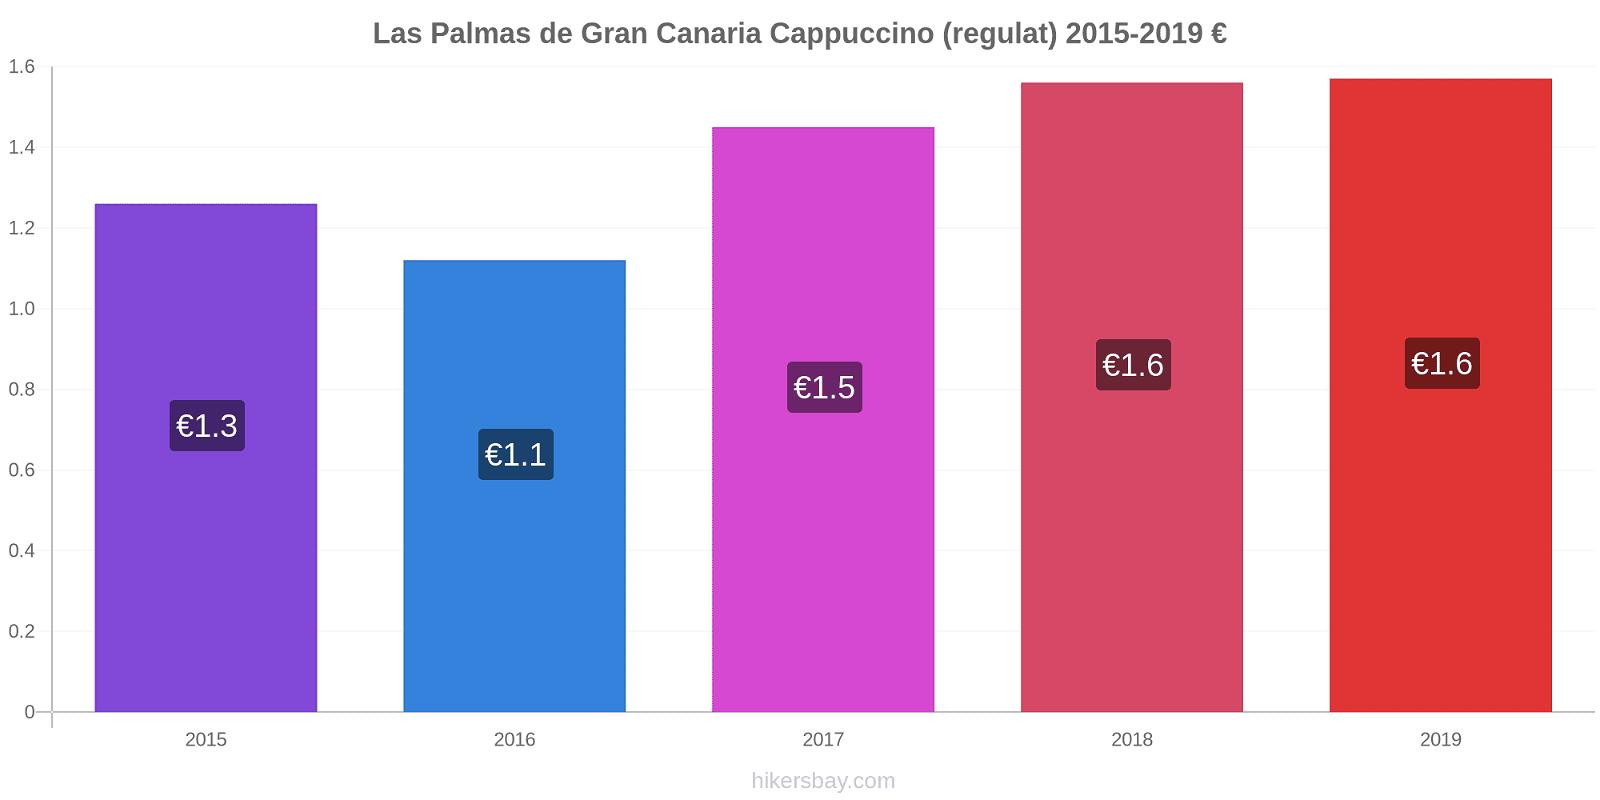 Las Palmas de Gran Canaria modificări de preț Cappuccino (regulat) hikersbay.com